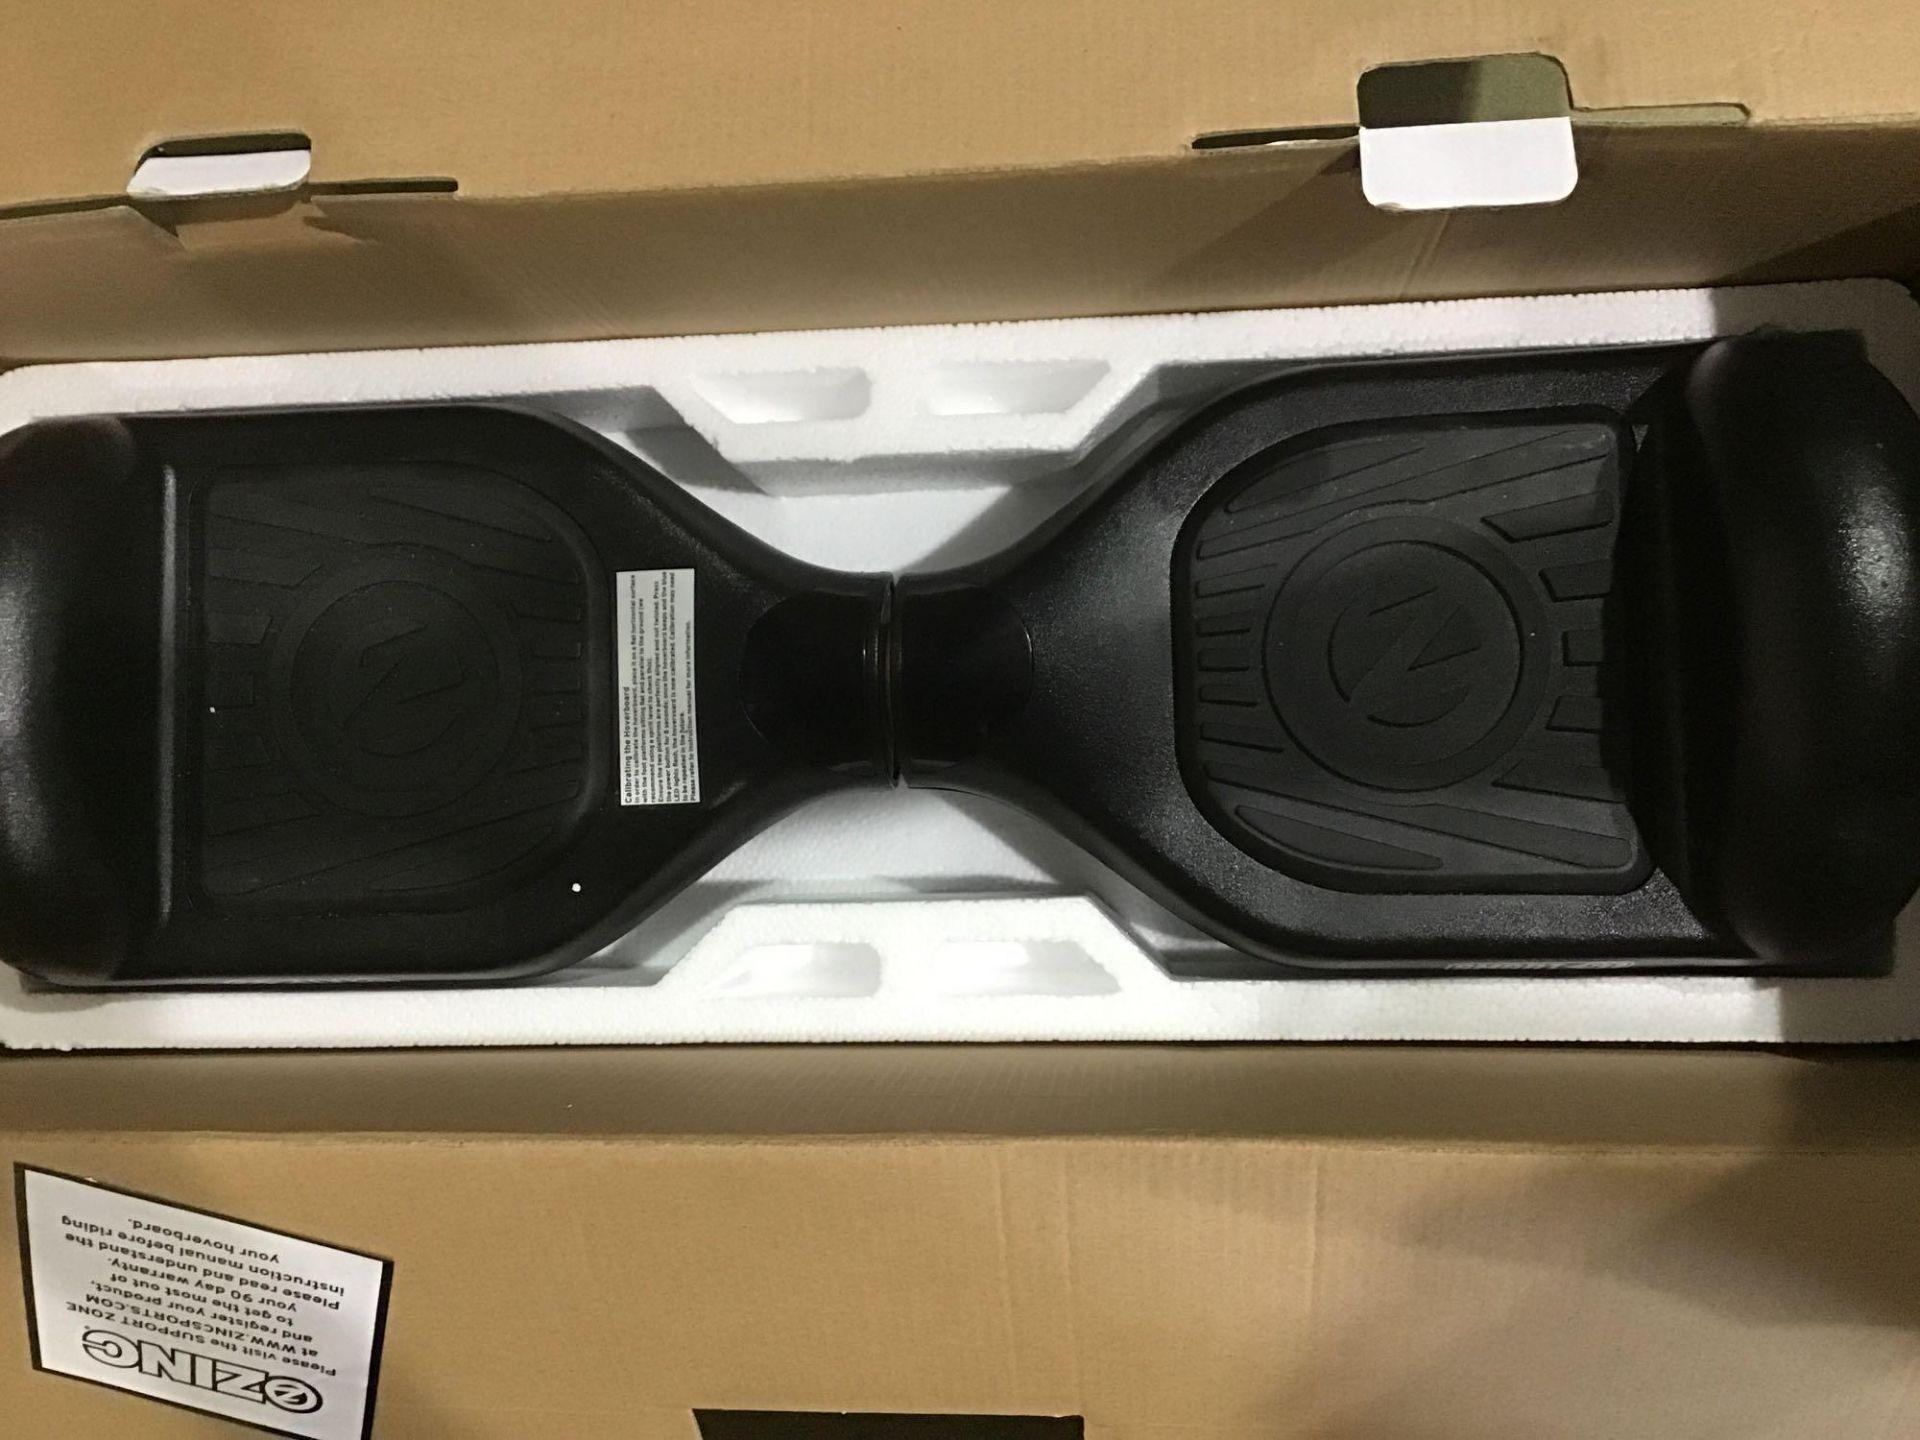 Zinc Smart ST Hoverboard £149.99 RRP